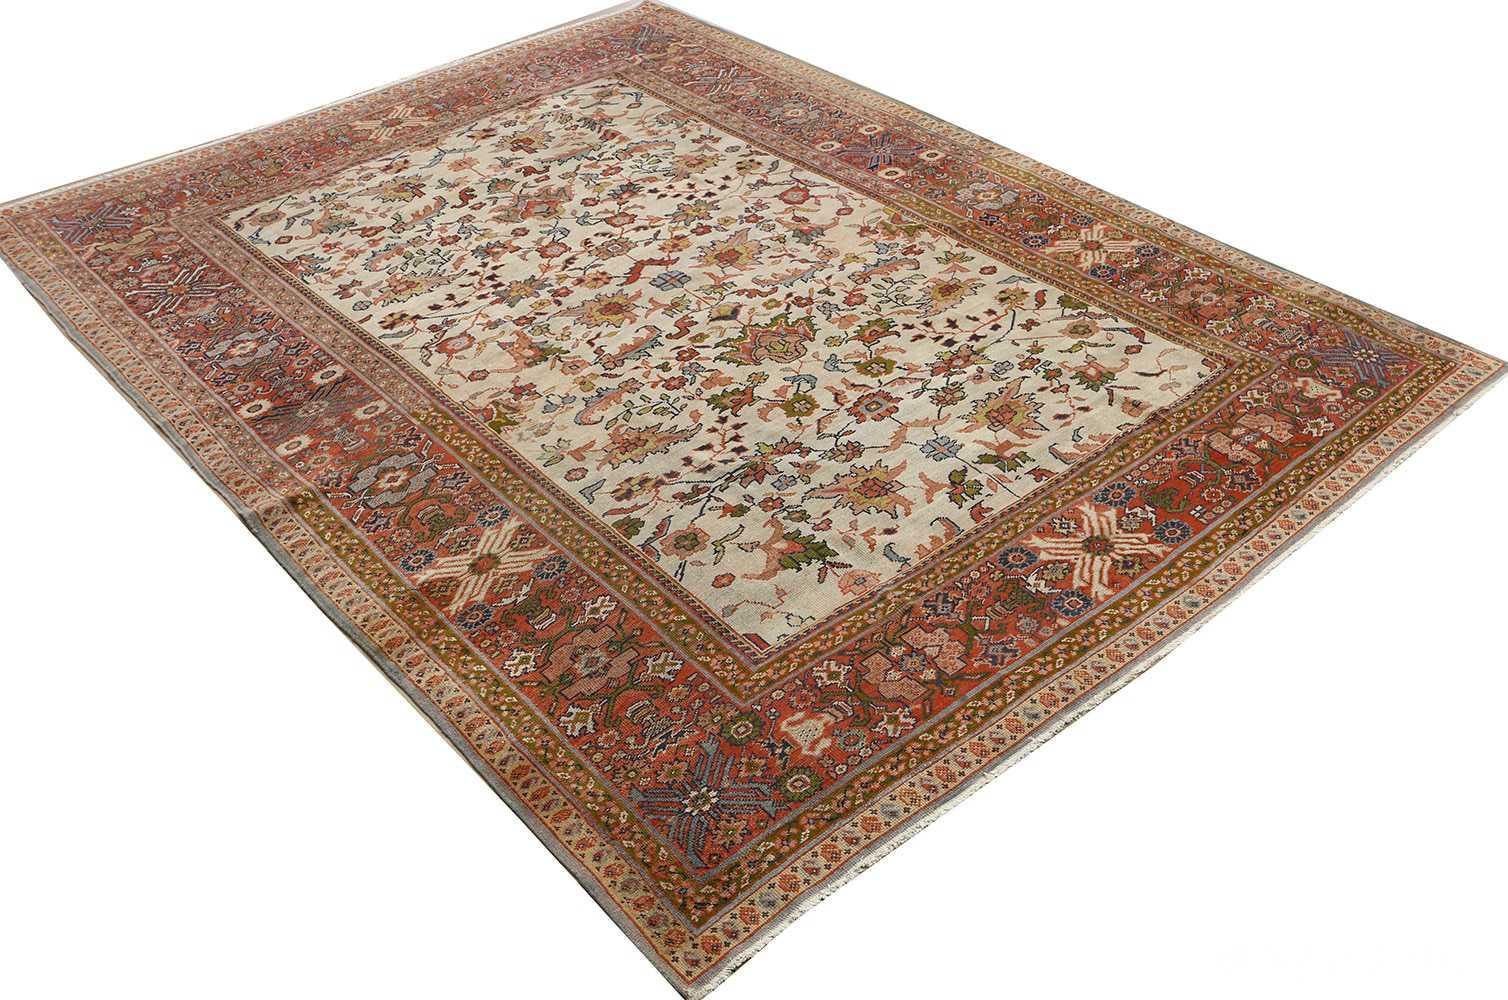 antique ivory background sultanabad persian rug 51101 side Nazmiyal